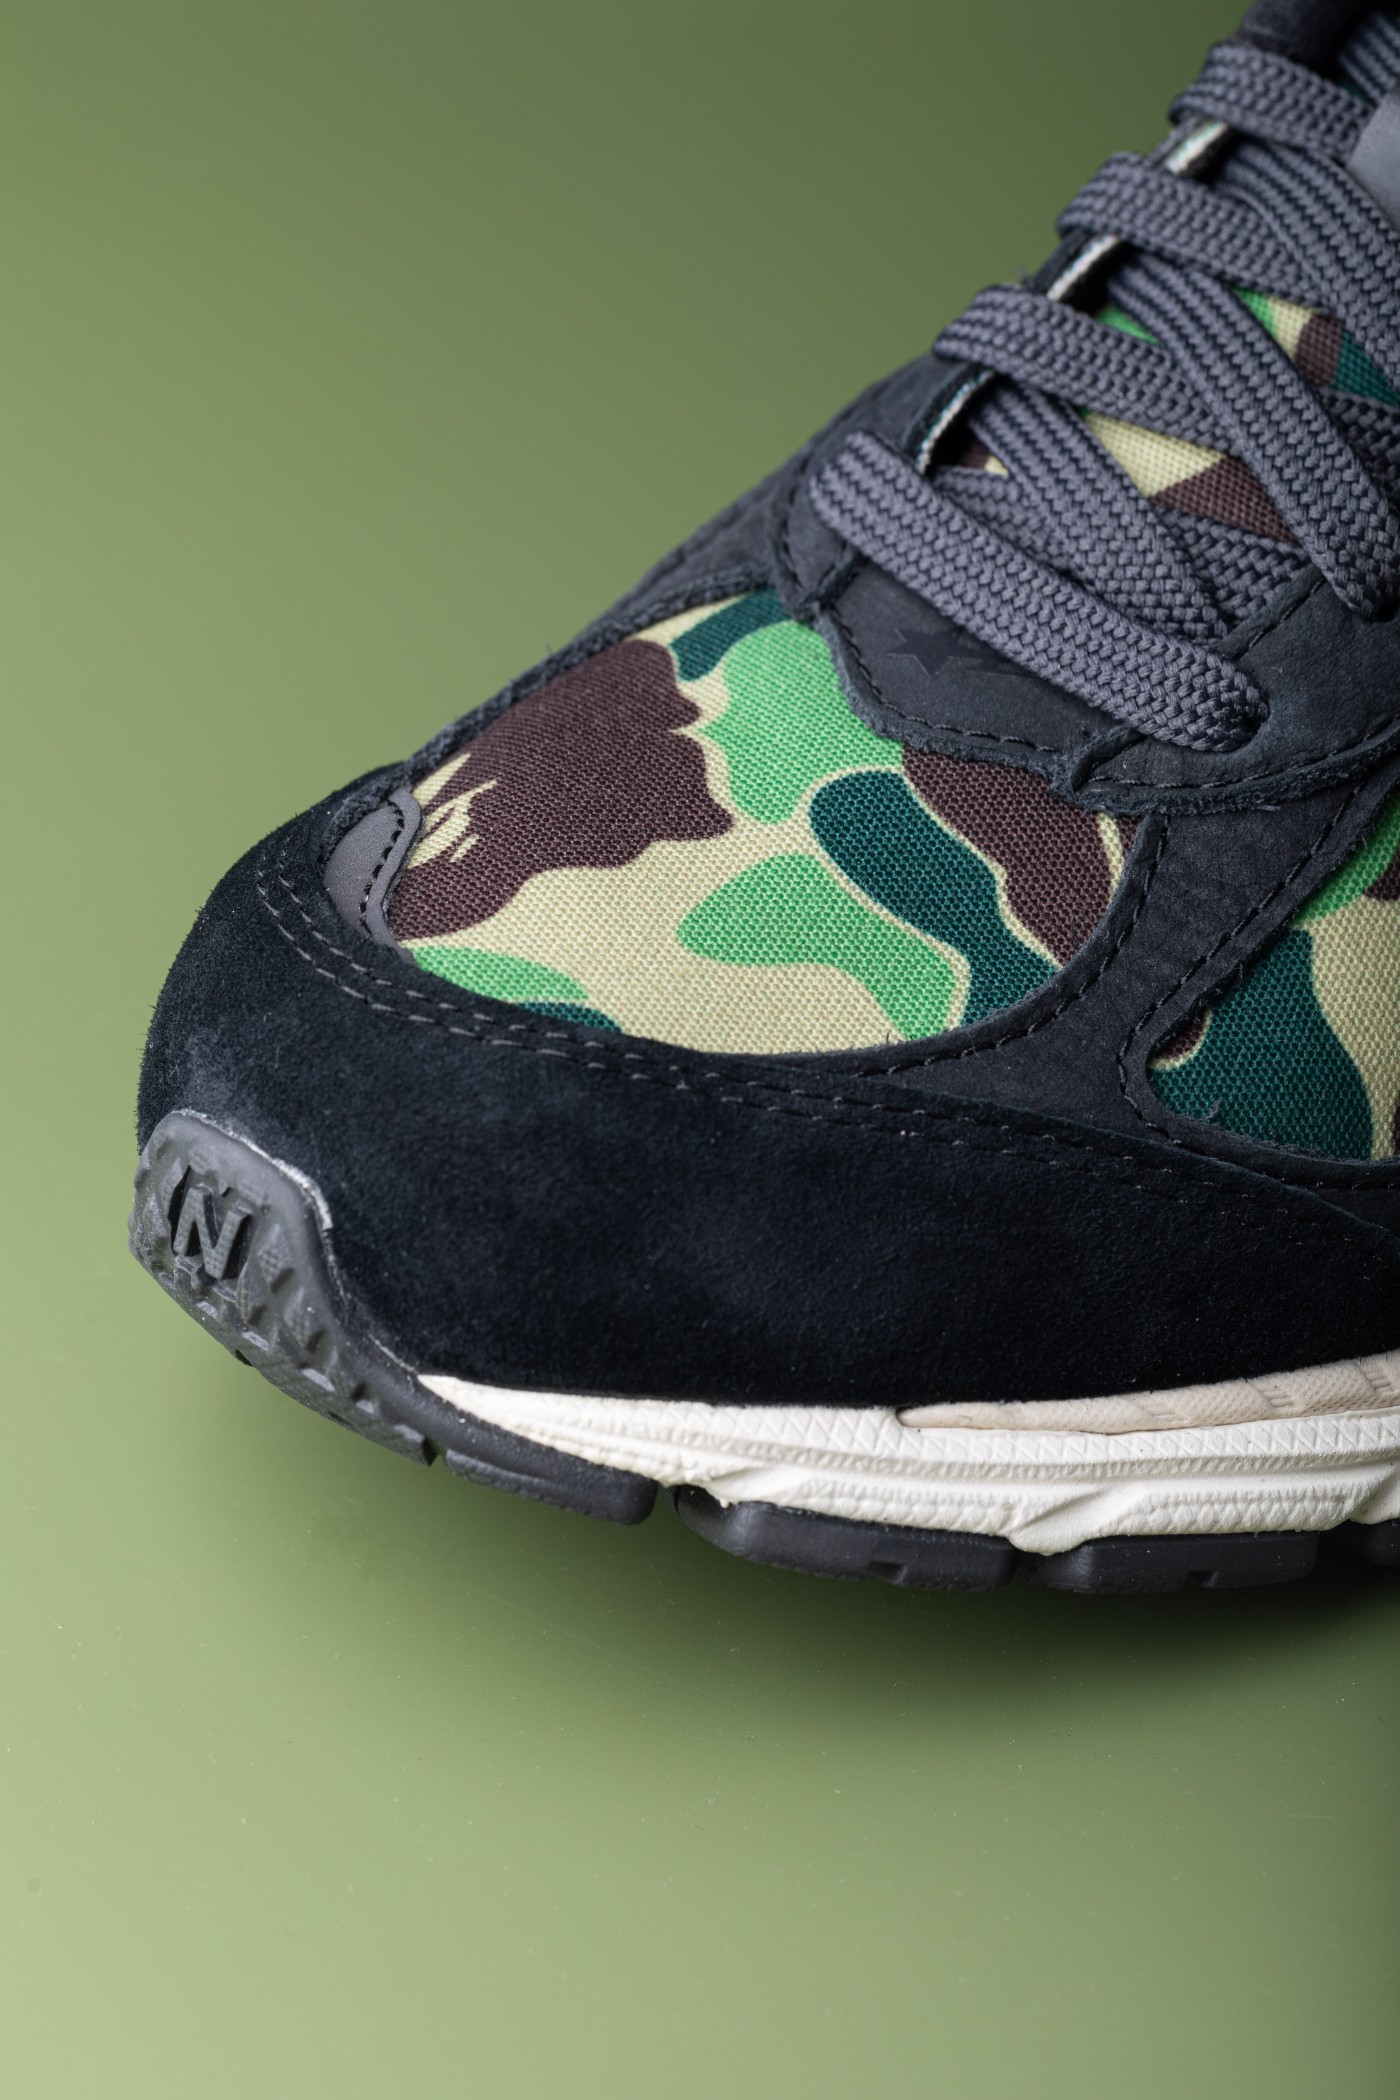 2002R,New Balance,BAPE  市价小 2 千!今年最「凶」的 New Balance 联名鞋刚刚发售!